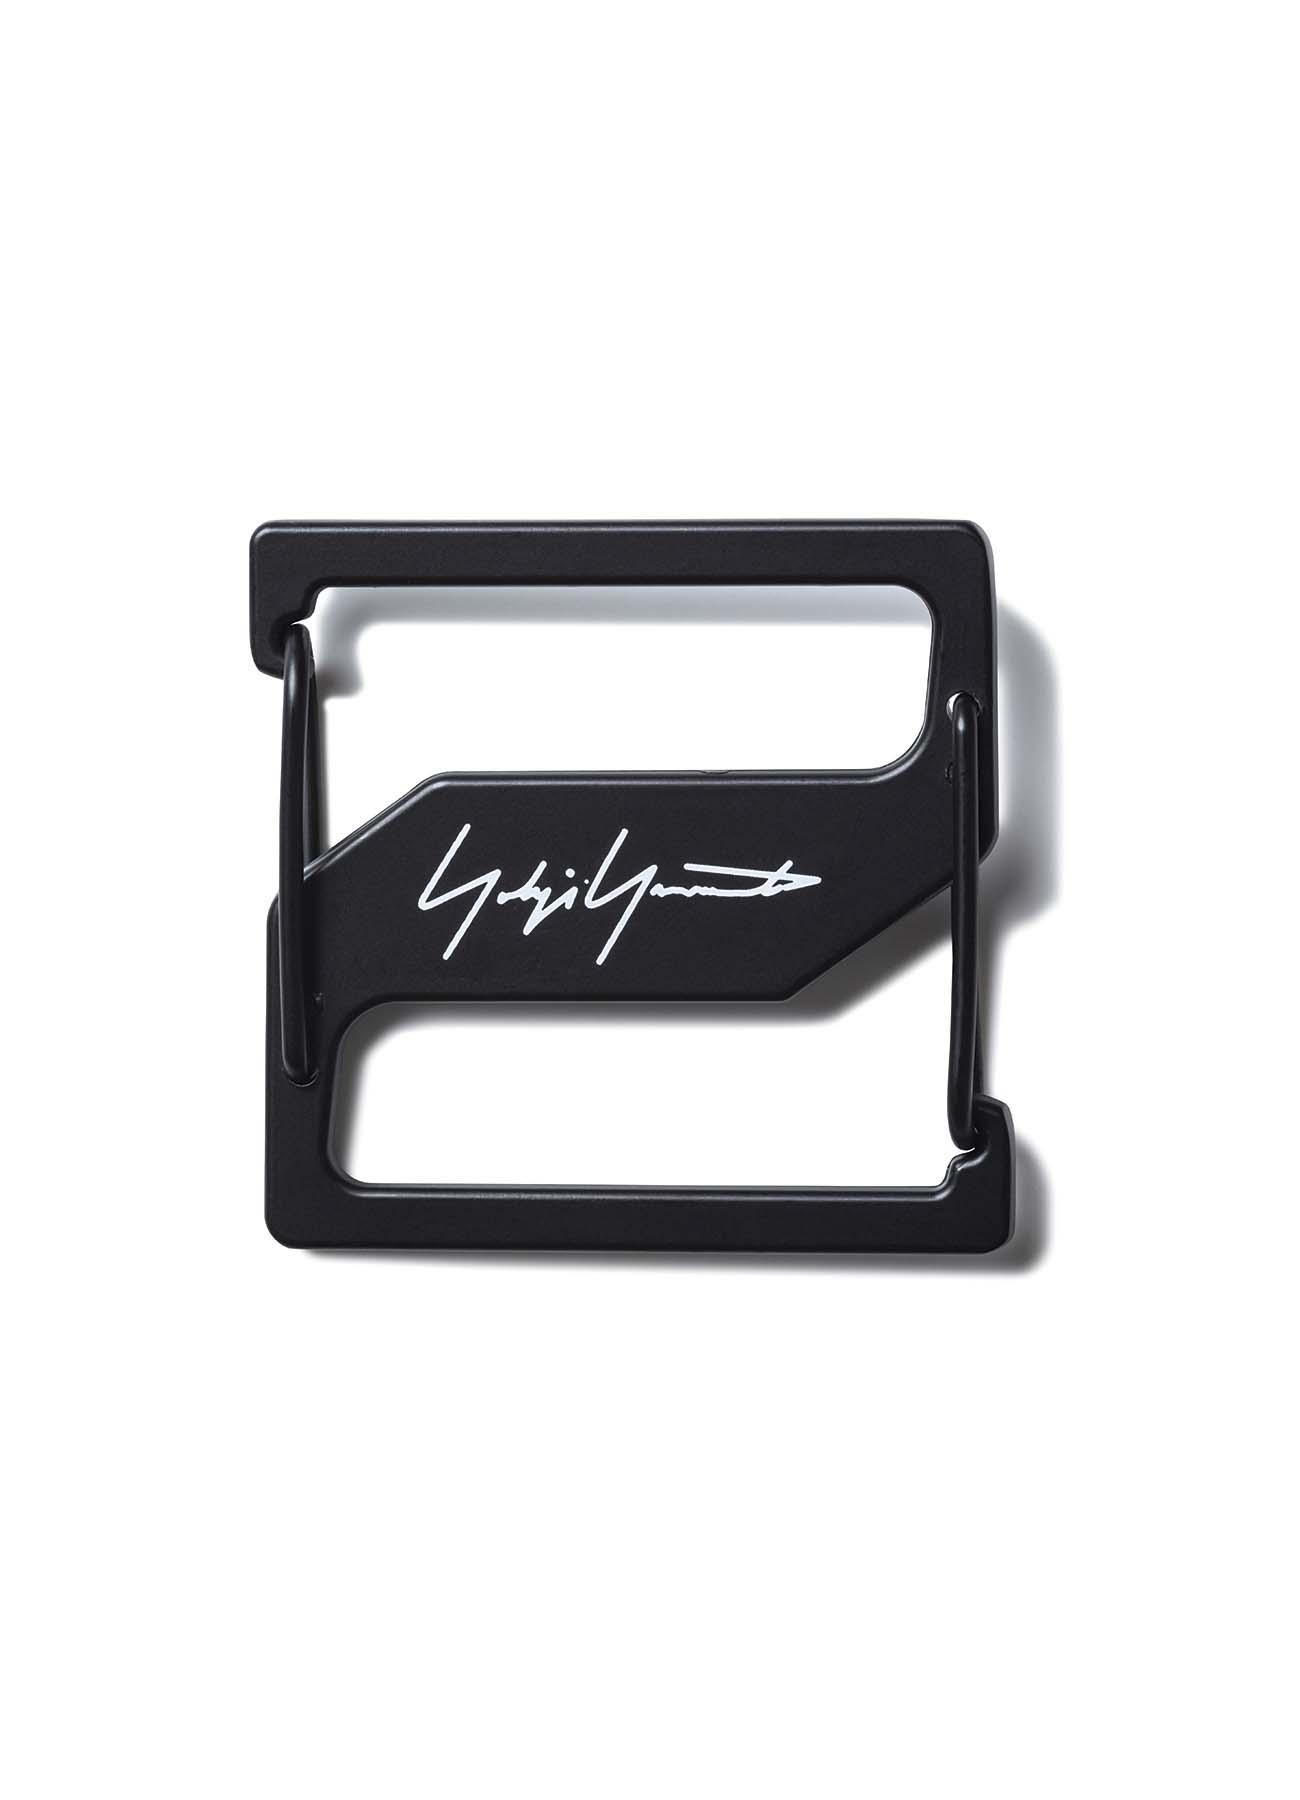 Yohji Yamamoto × New Era 1680D/BKPE Rucksack Metal Plate